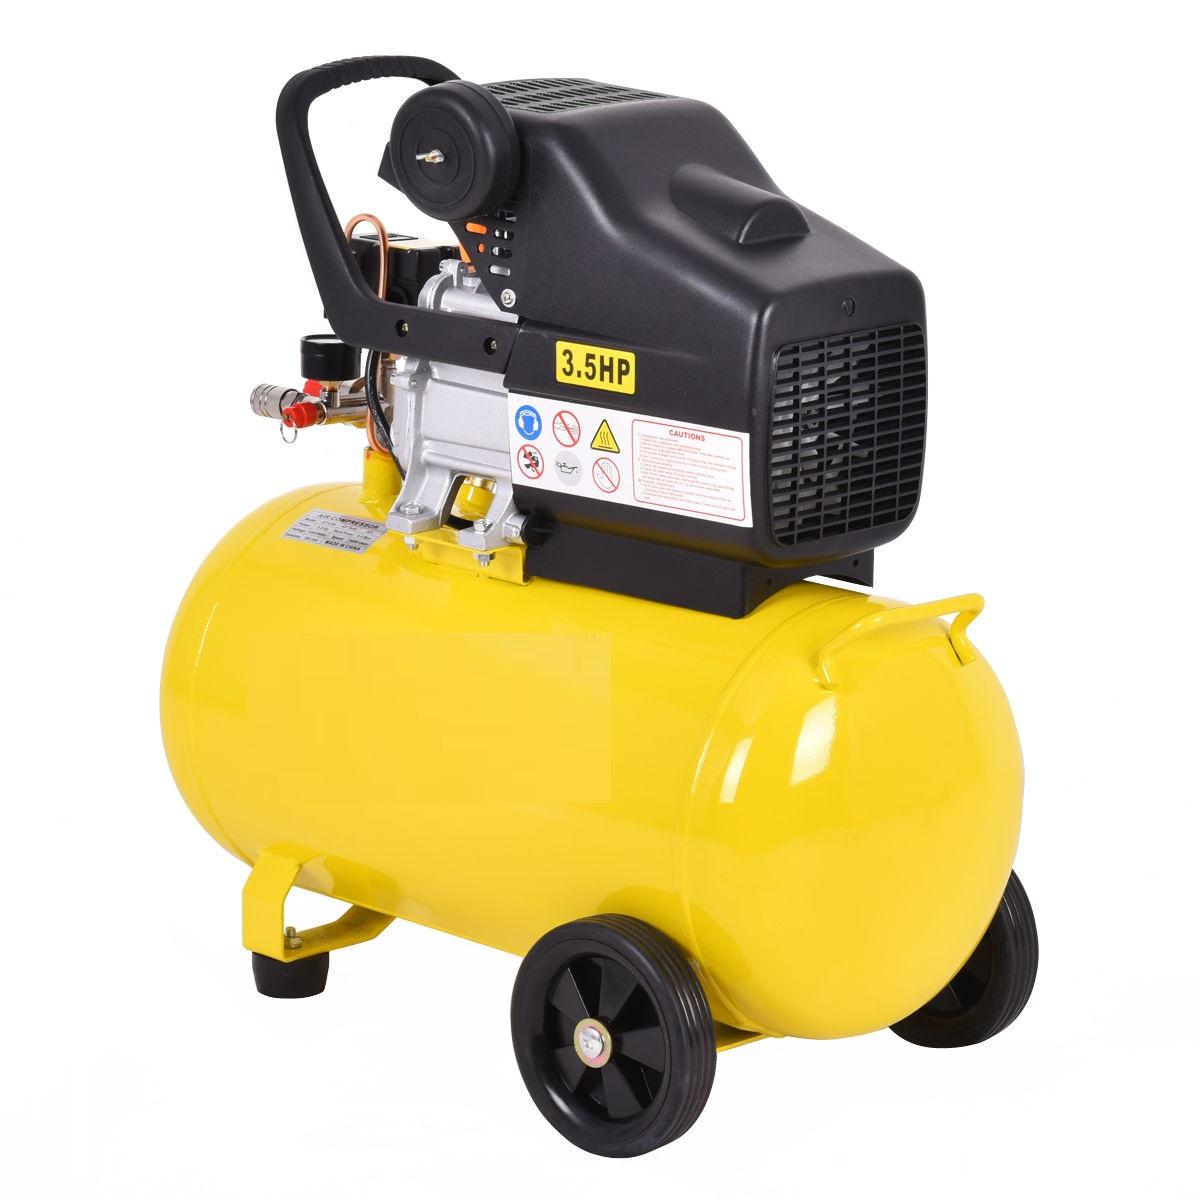 Heavy duty 3 5 hp 110v 10 gallon air compressor adjustable for 5 hp 110v electric motor